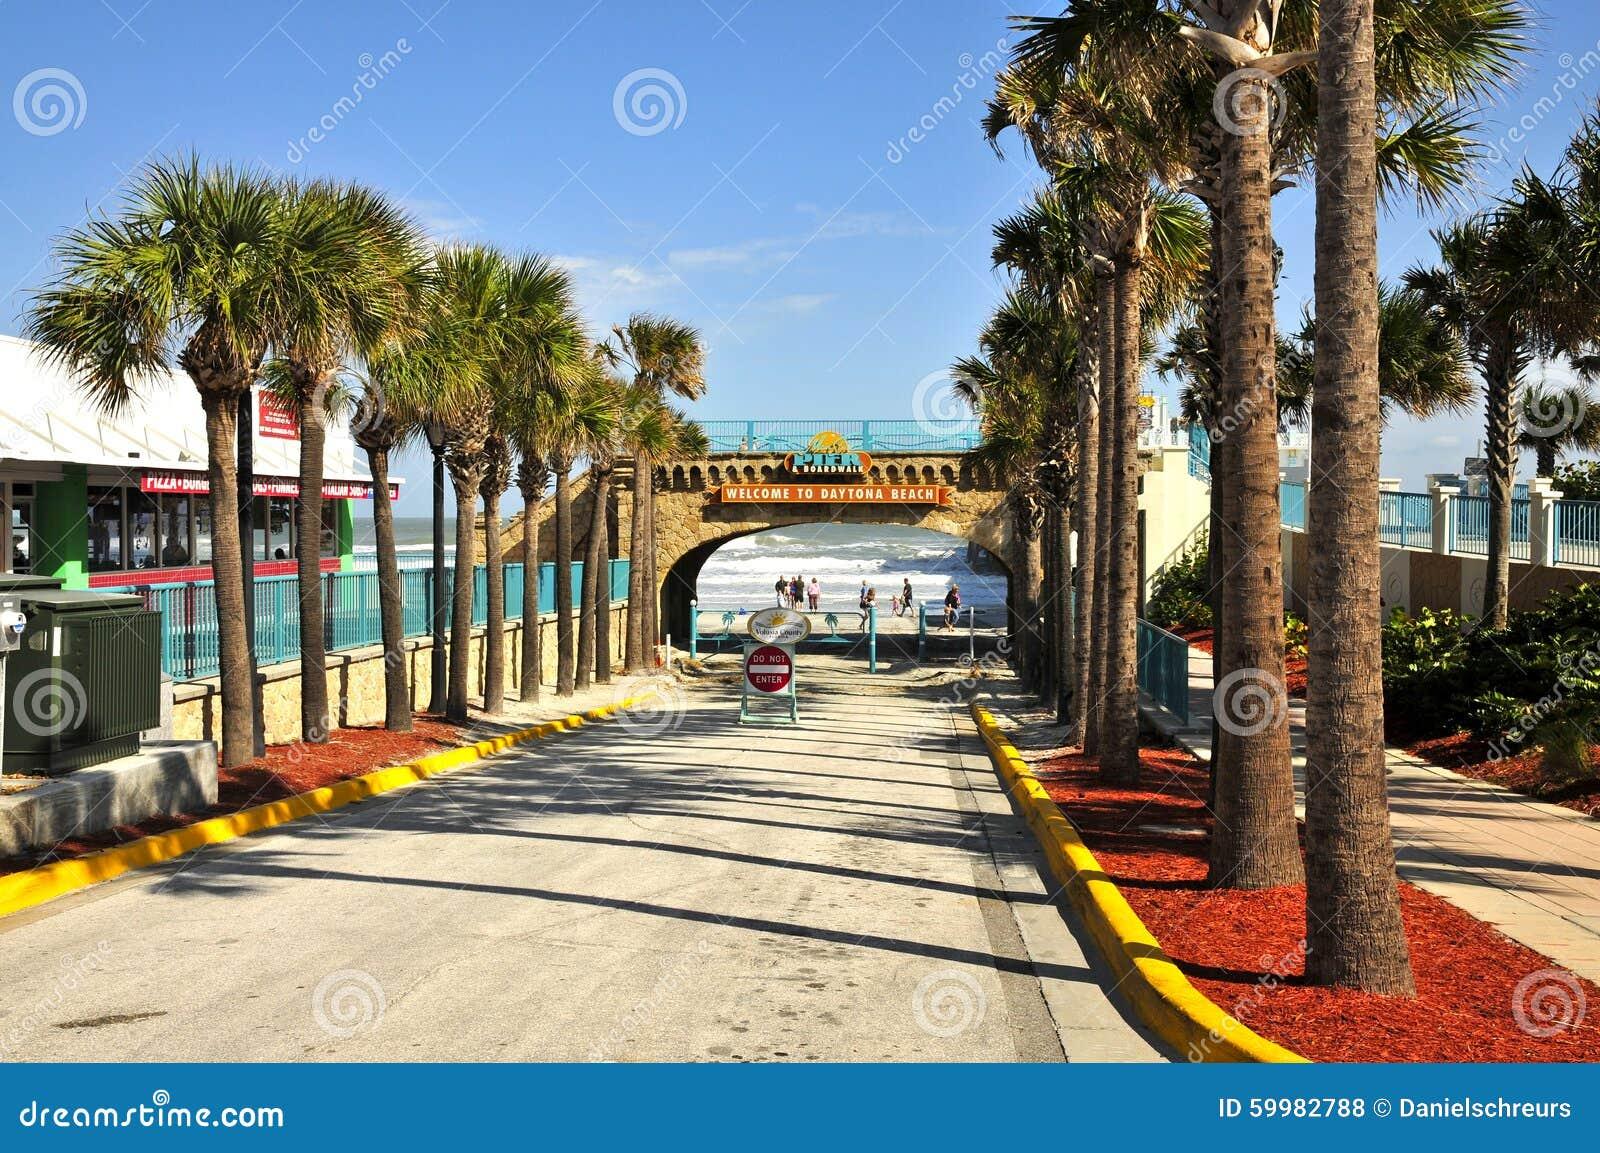 Daytona beach from the pier fishing pole royalty free for Florida free fishing days